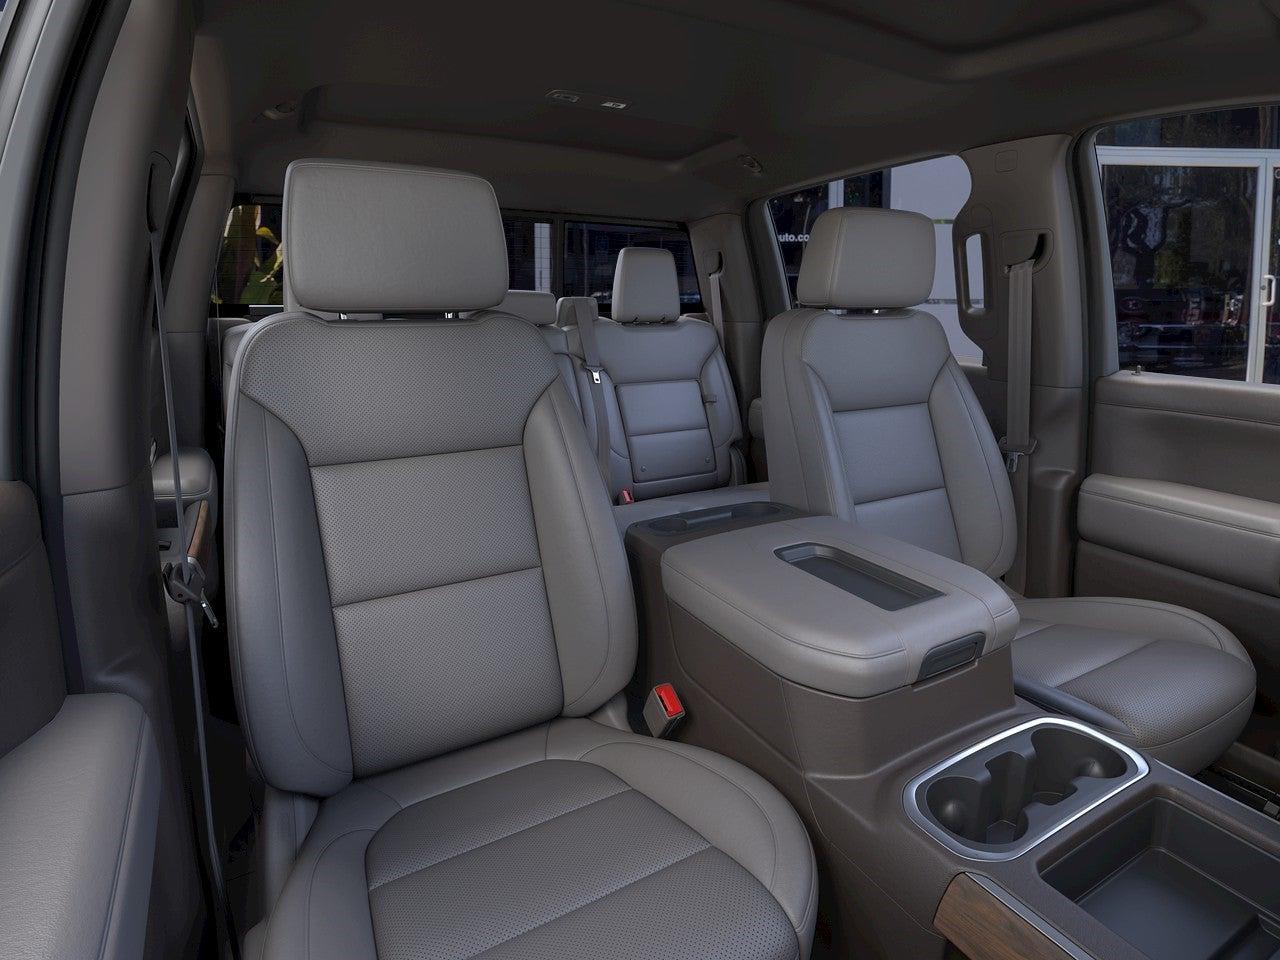 2021 GMC Sierra 1500 Crew Cab 4x4, Pickup #T21420 - photo 33